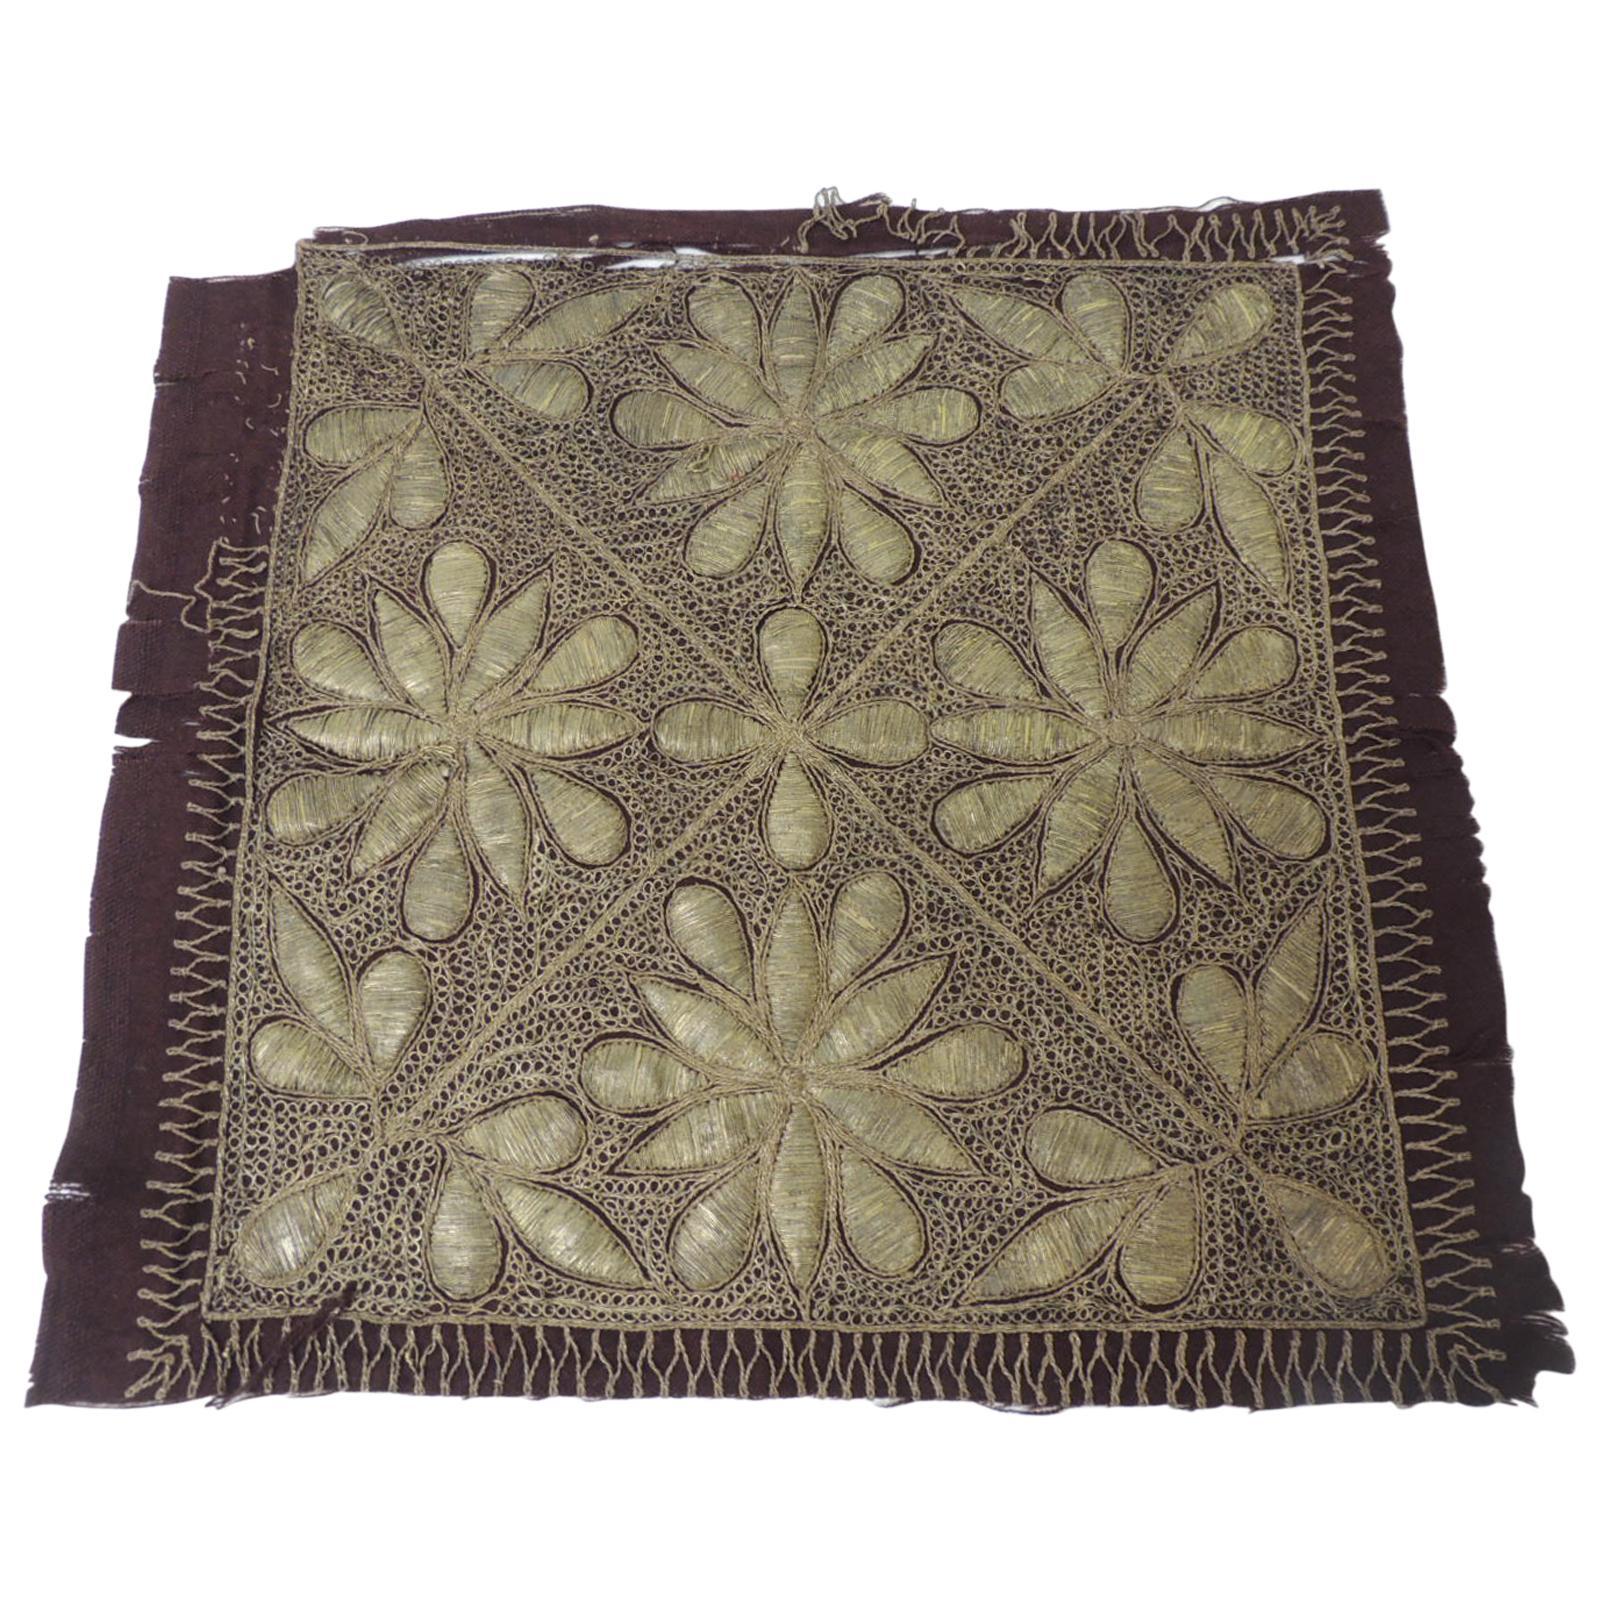 19th Century Persian Ottoman Empire Gold Metallic Threads Embroidered Textile